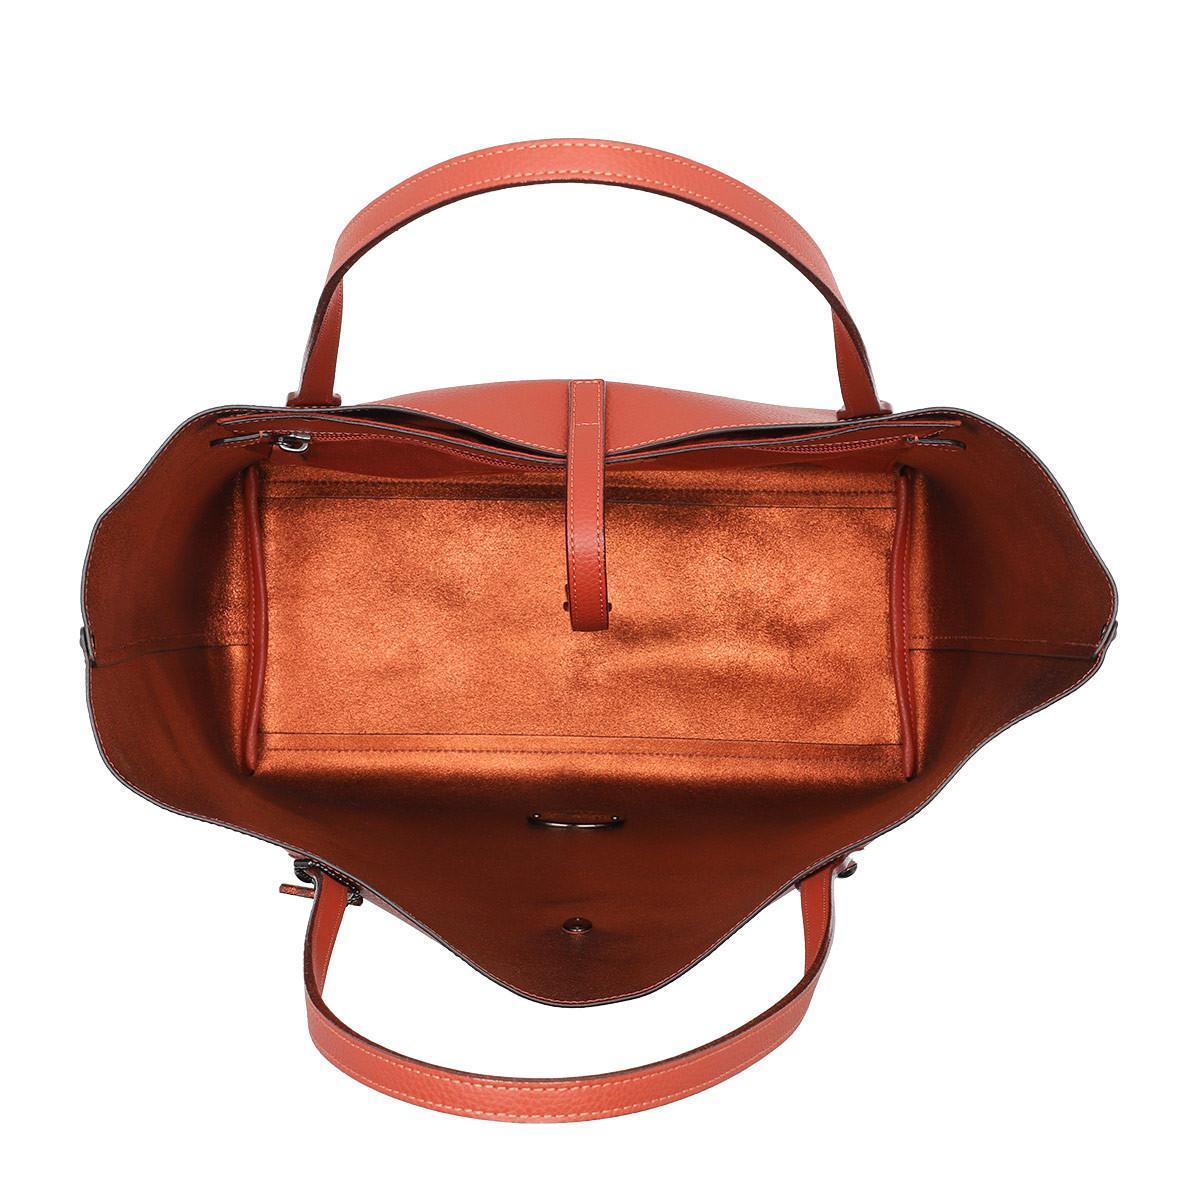 COACH Leather Metallic Lining Market Tote Vermillion/metallic Brick in Orange